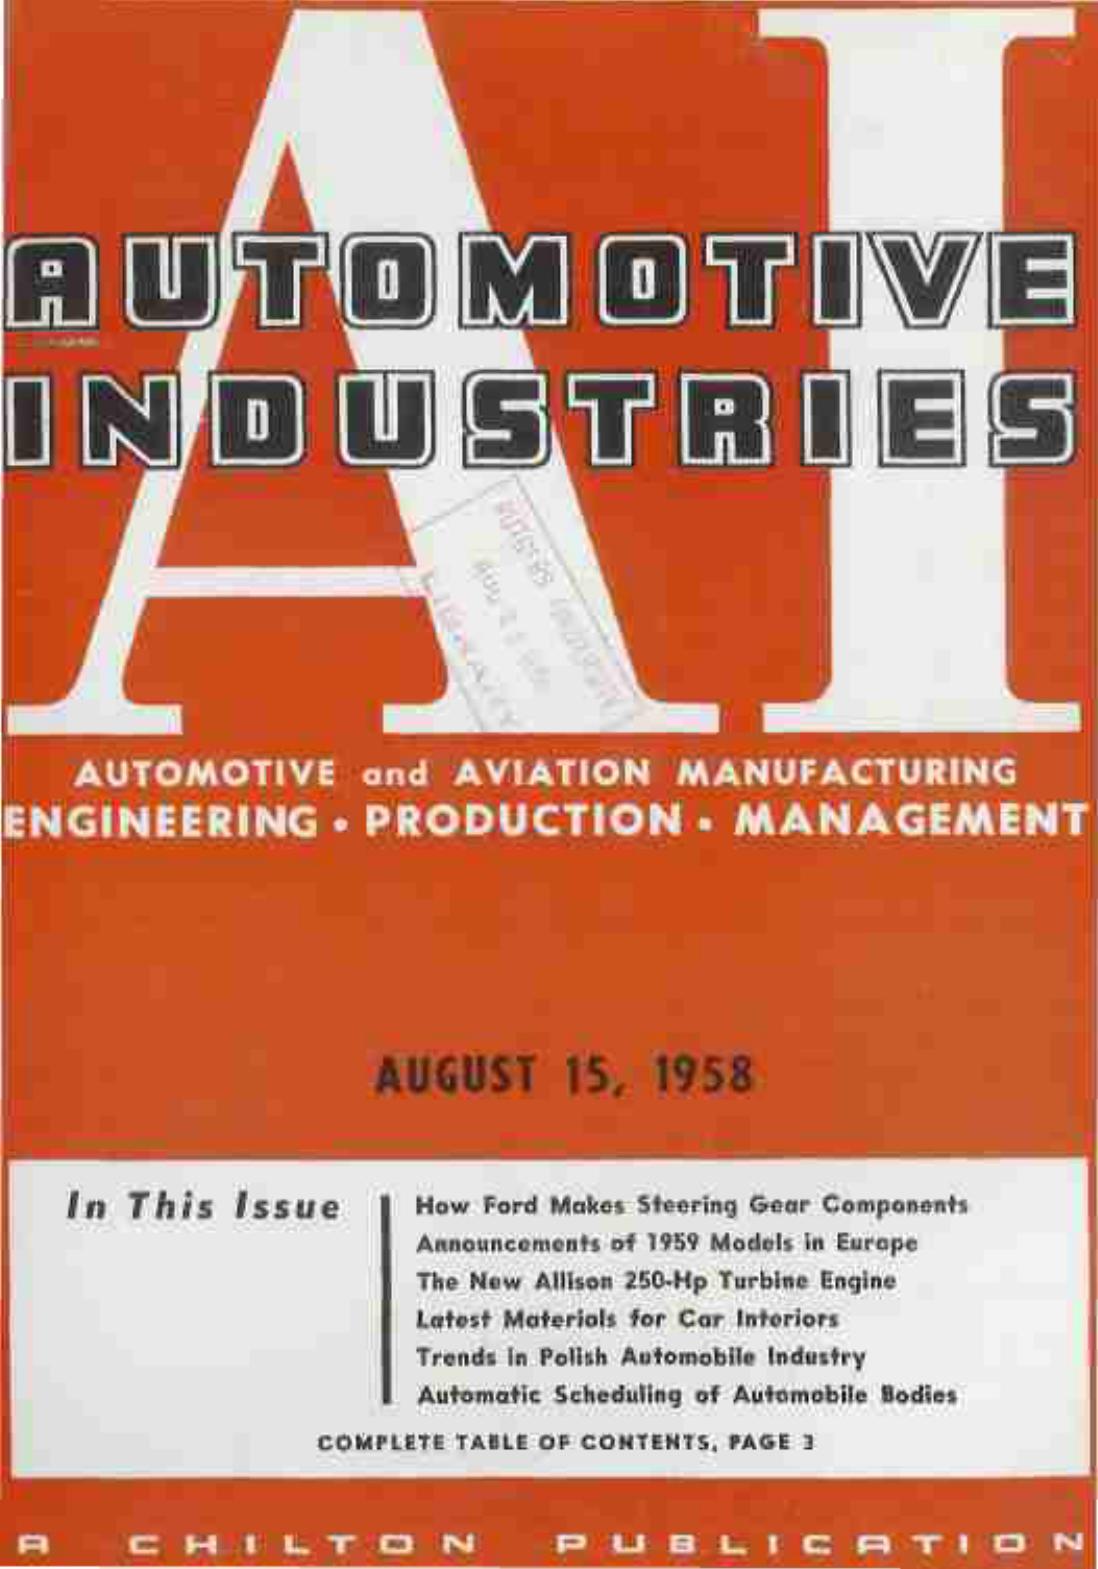 august 15, 1958 - Automotive Industries | manualzz com